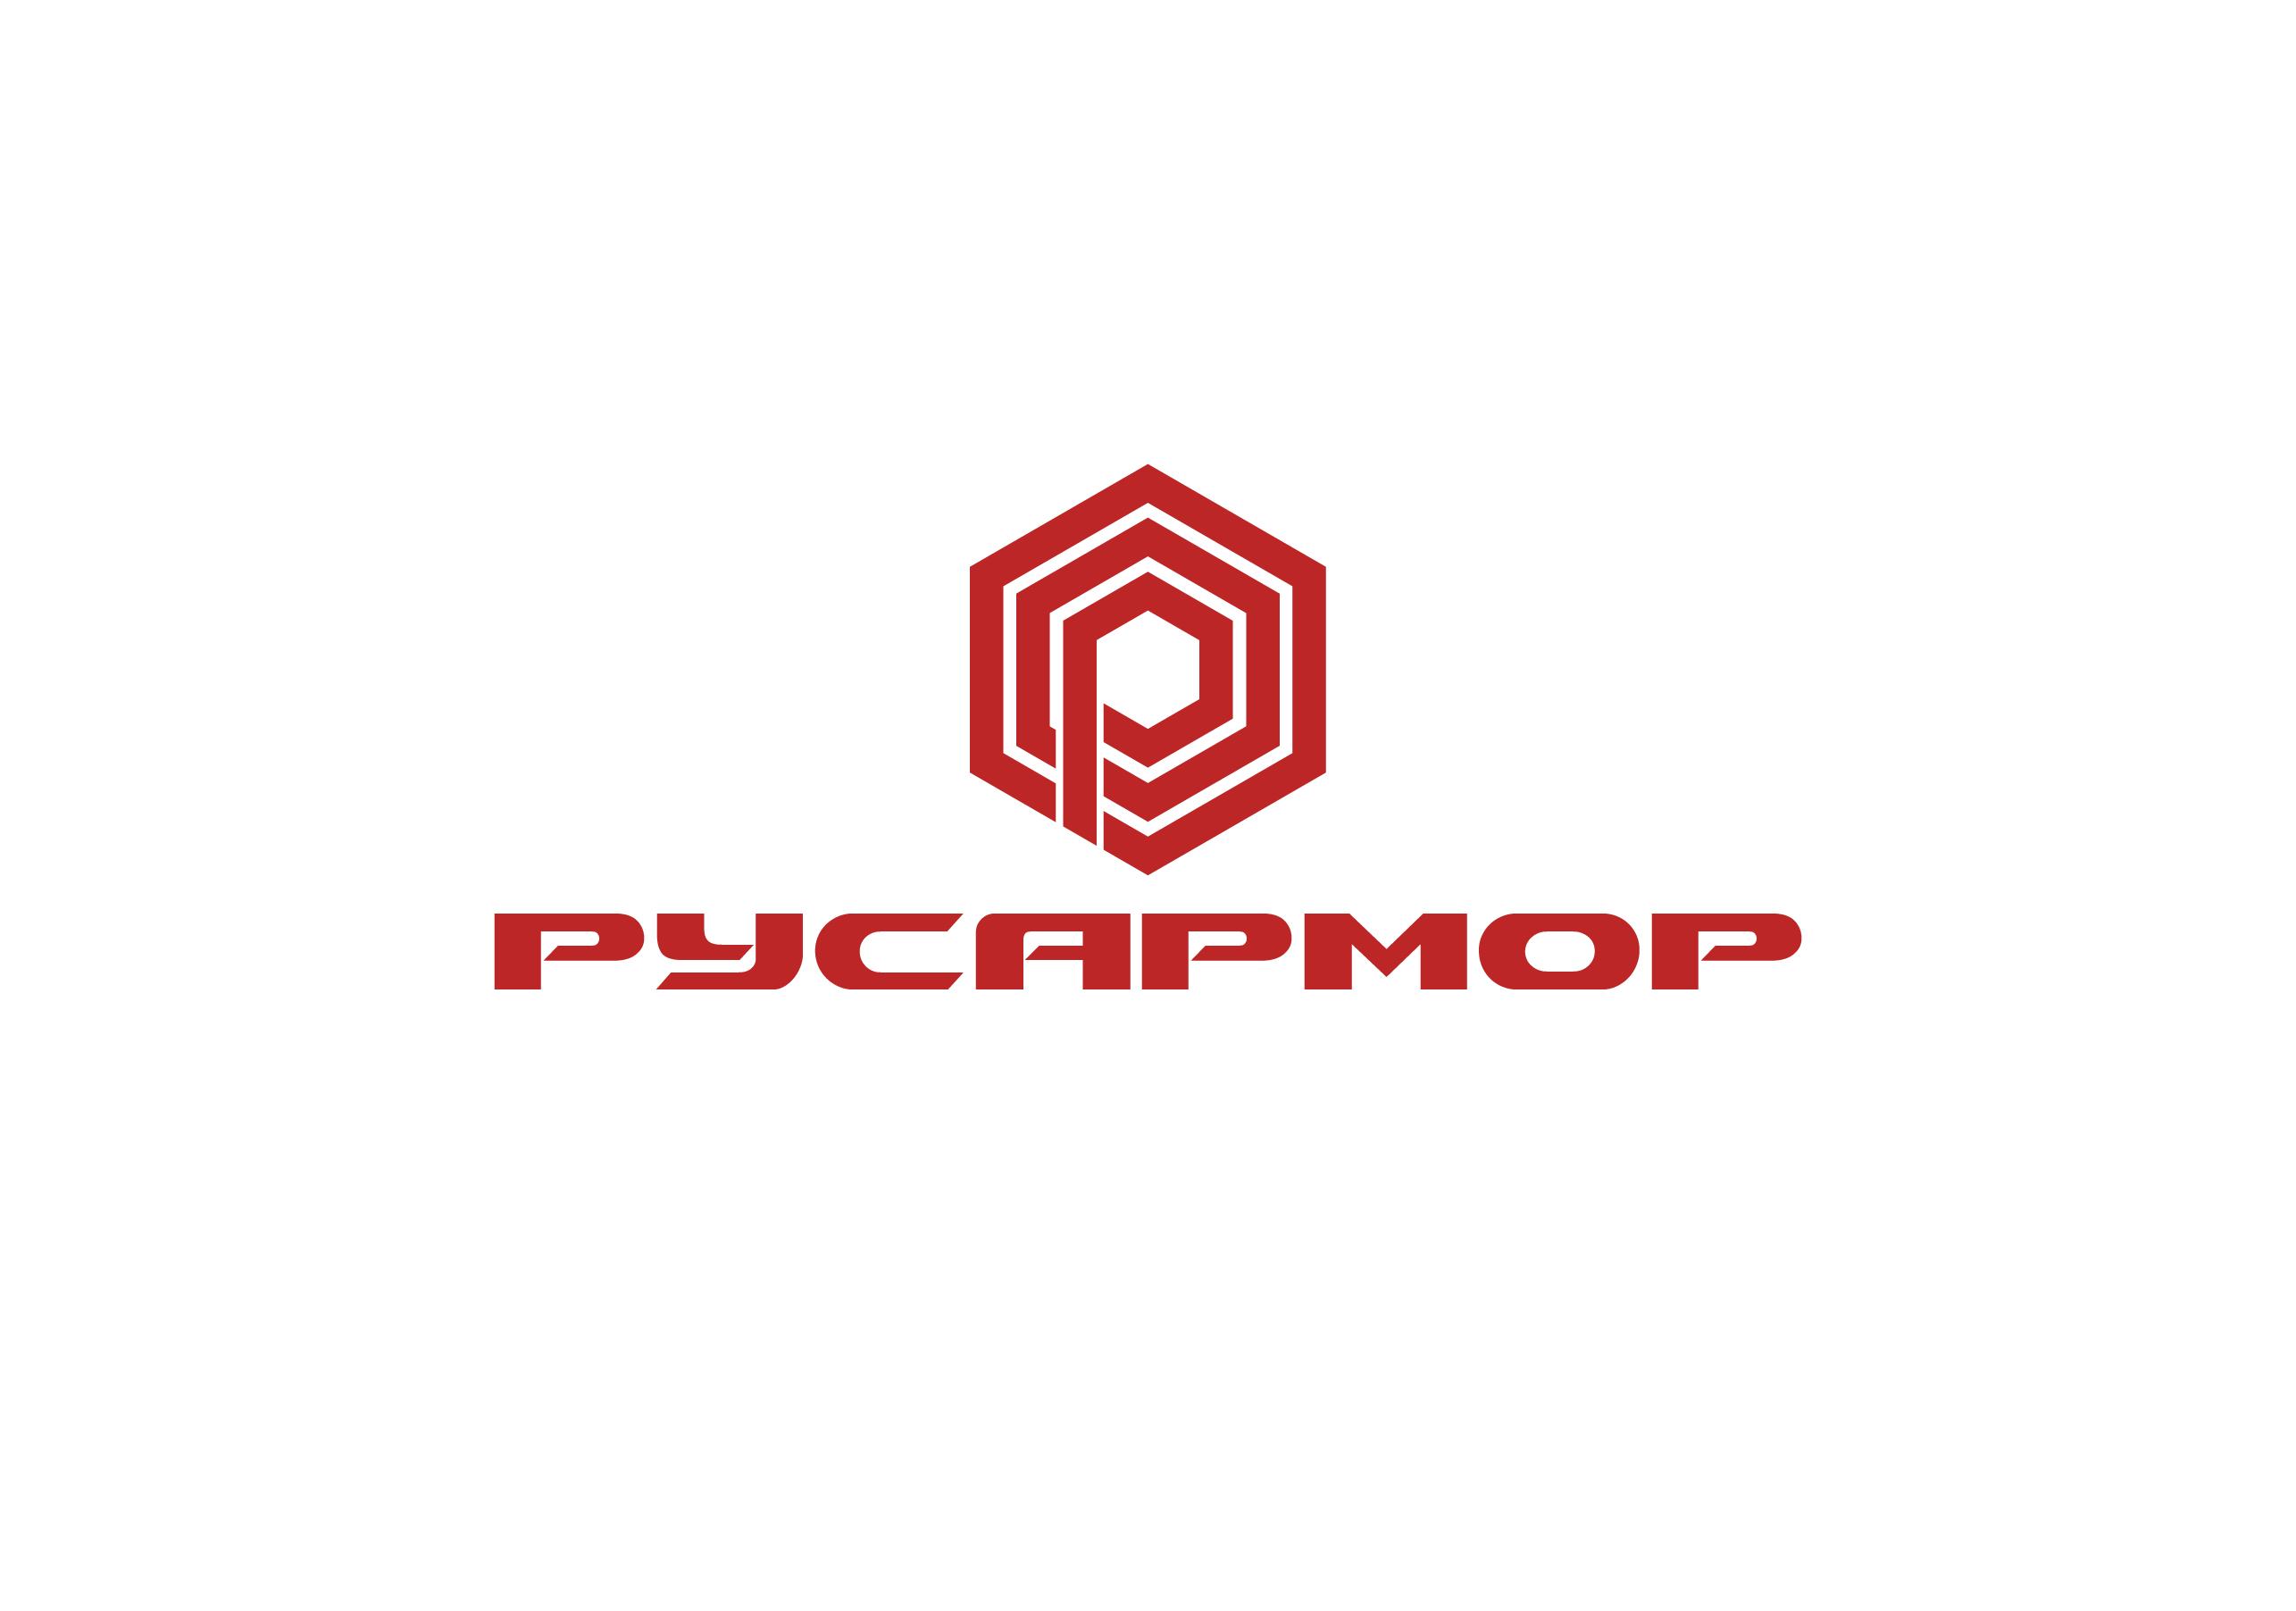 Разработка логотипа технологического стартапа РУСАРМОР фото f_4395a0bf2733b636.jpg